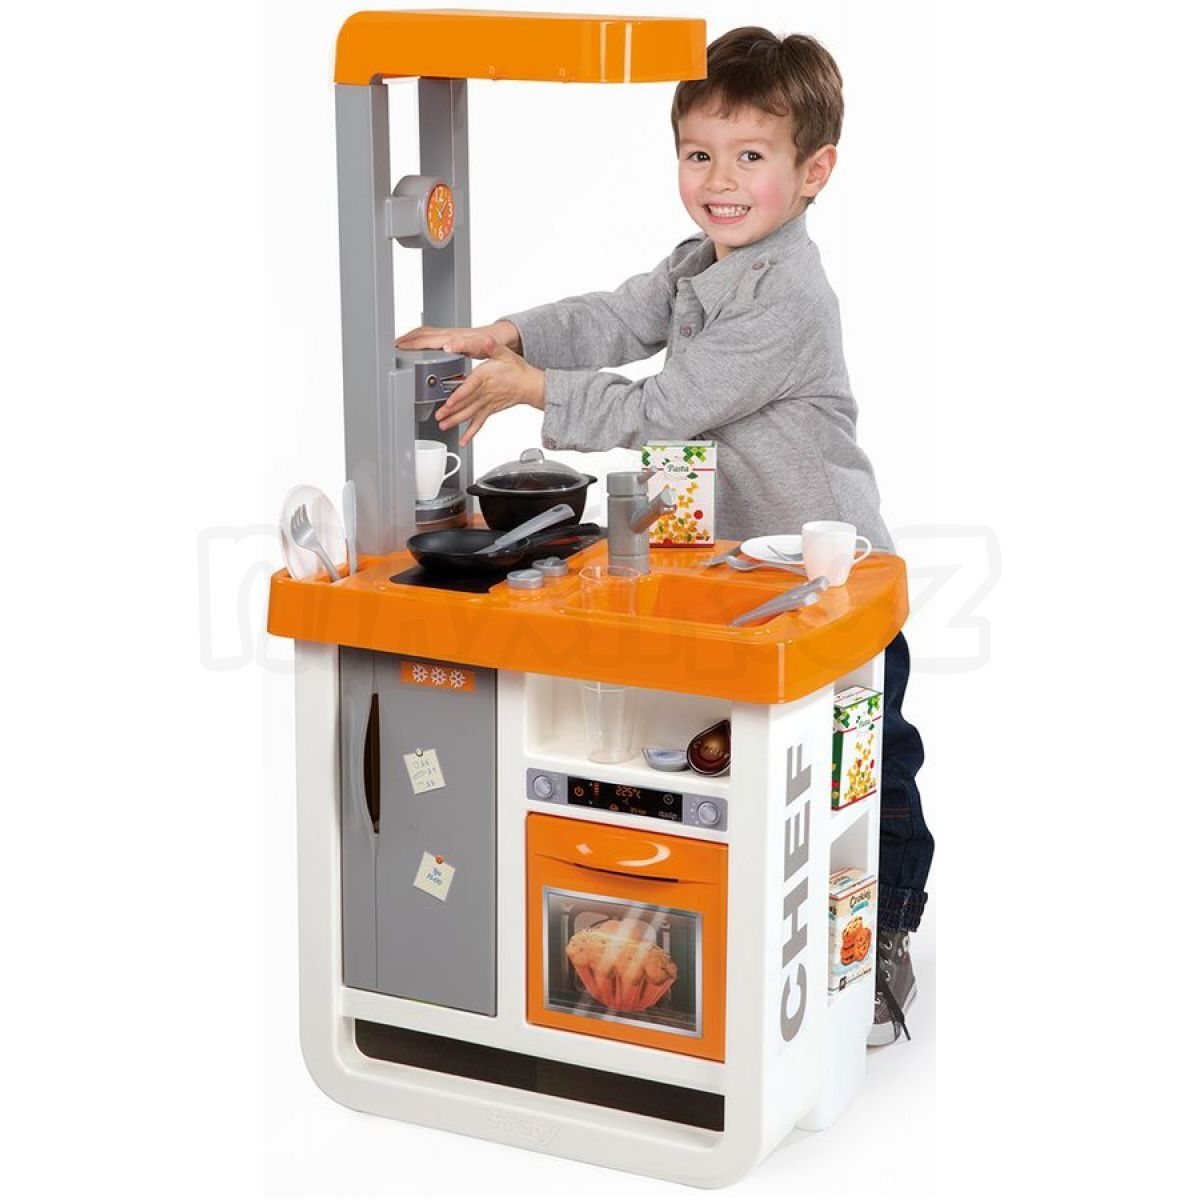 smoby kuchy ka bon appetit oran ov max kovy hra ky. Black Bedroom Furniture Sets. Home Design Ideas